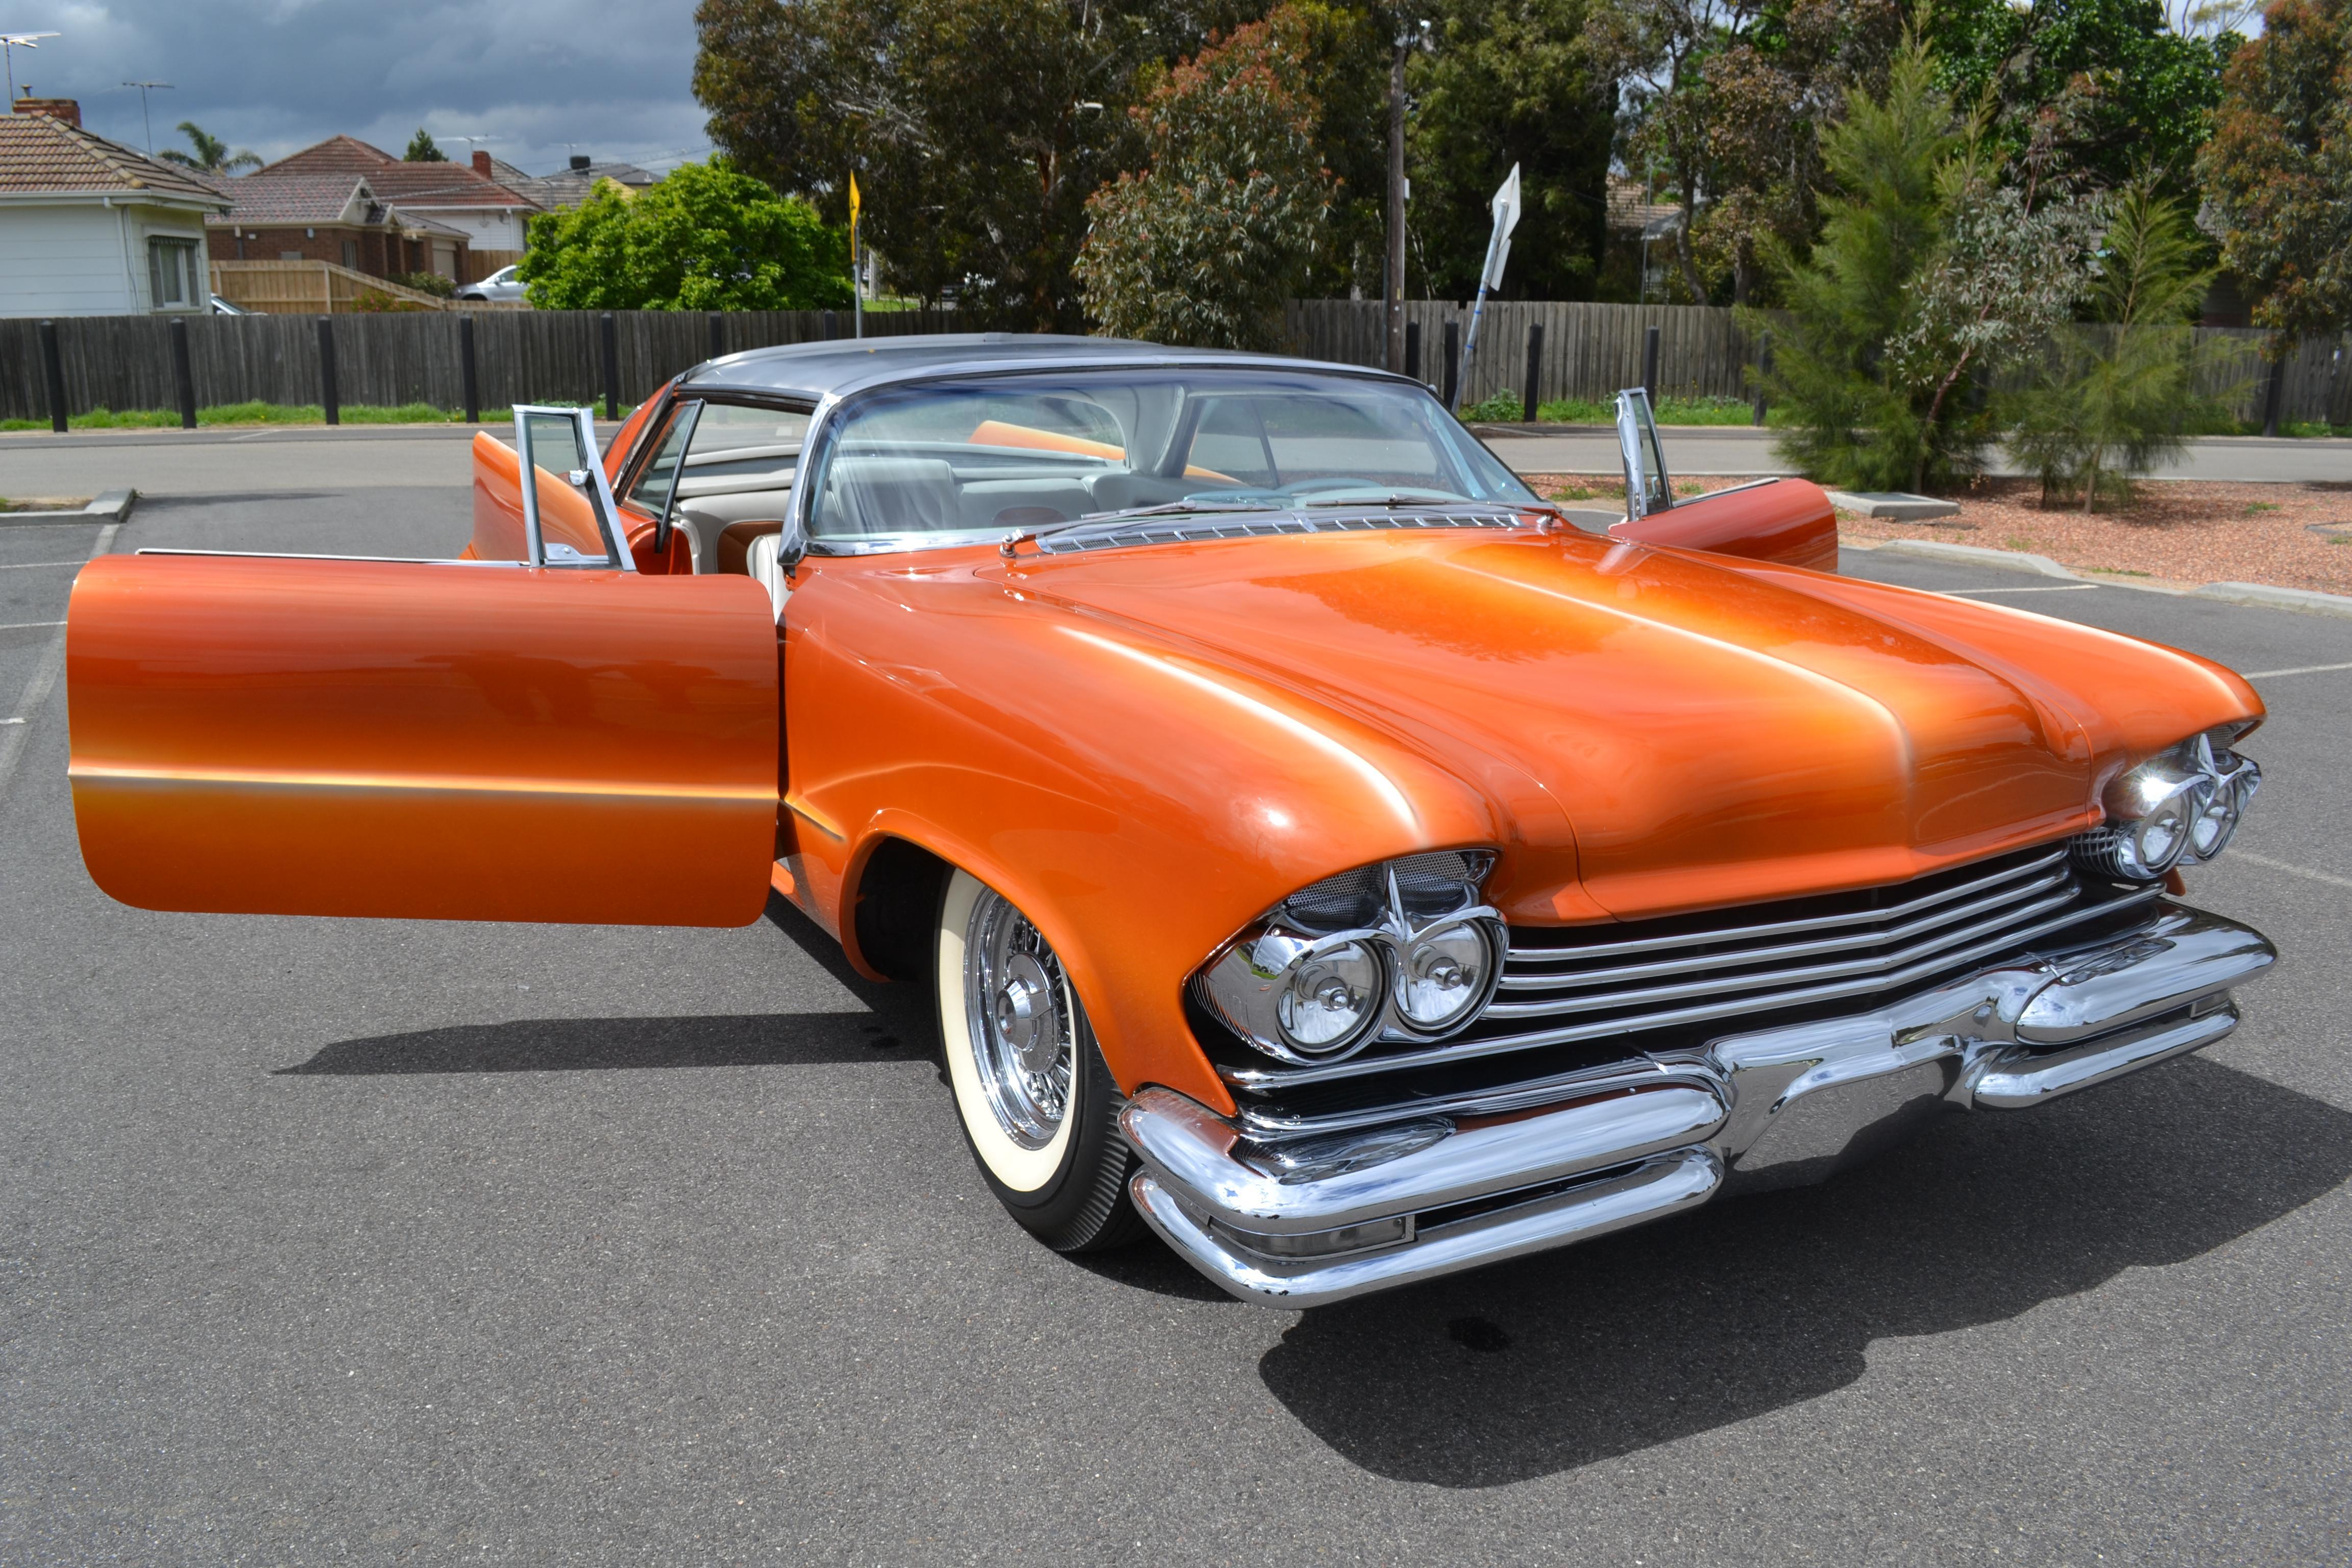 Chrysler USA Imperial Royale 1957 for sale | Autoclassics.com